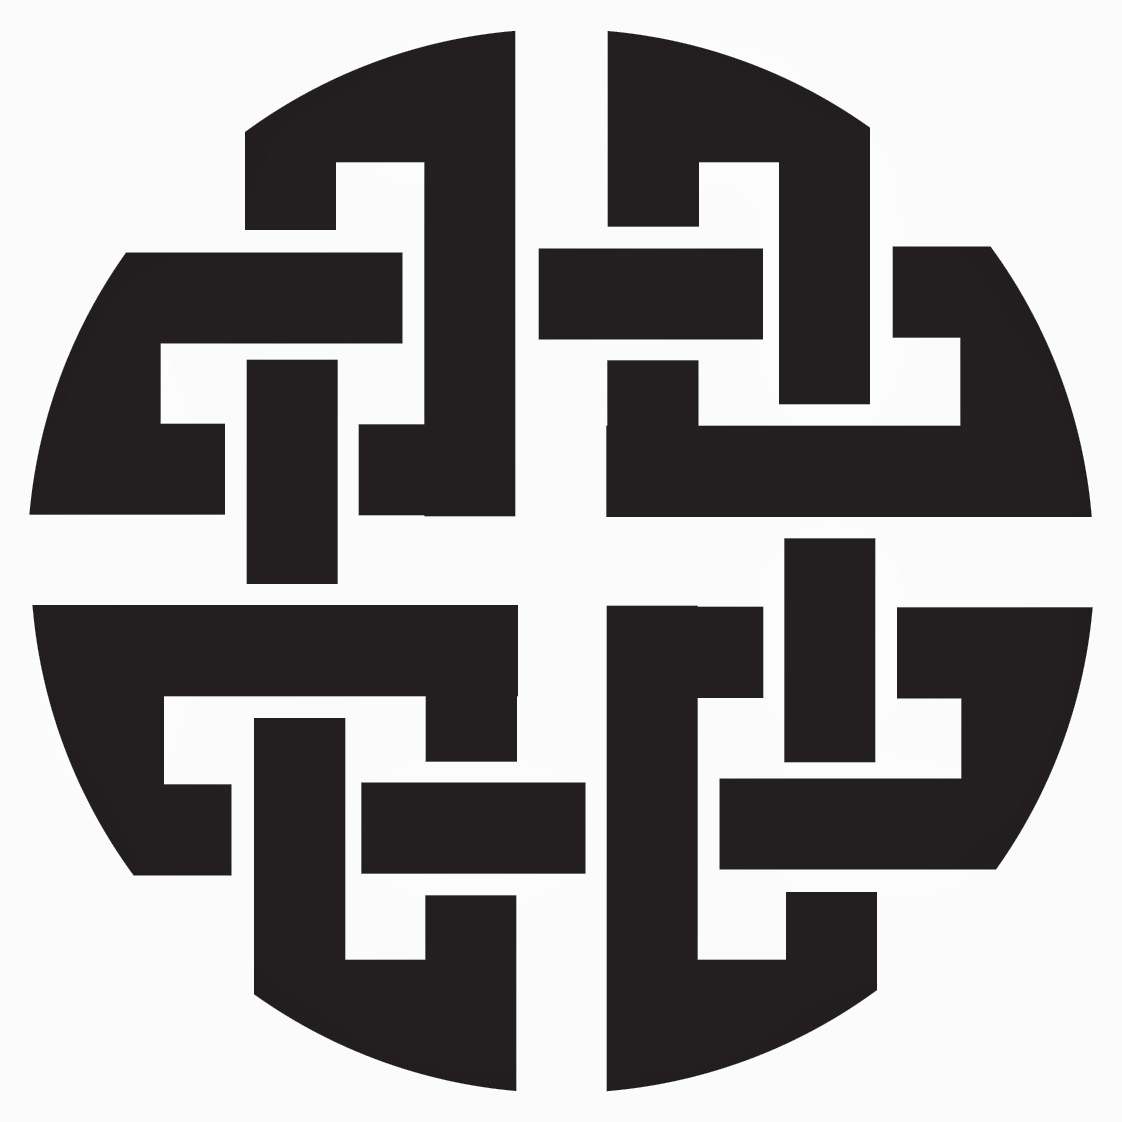 Mandalas calma vinilos deco - Feng shui prosperidad ...